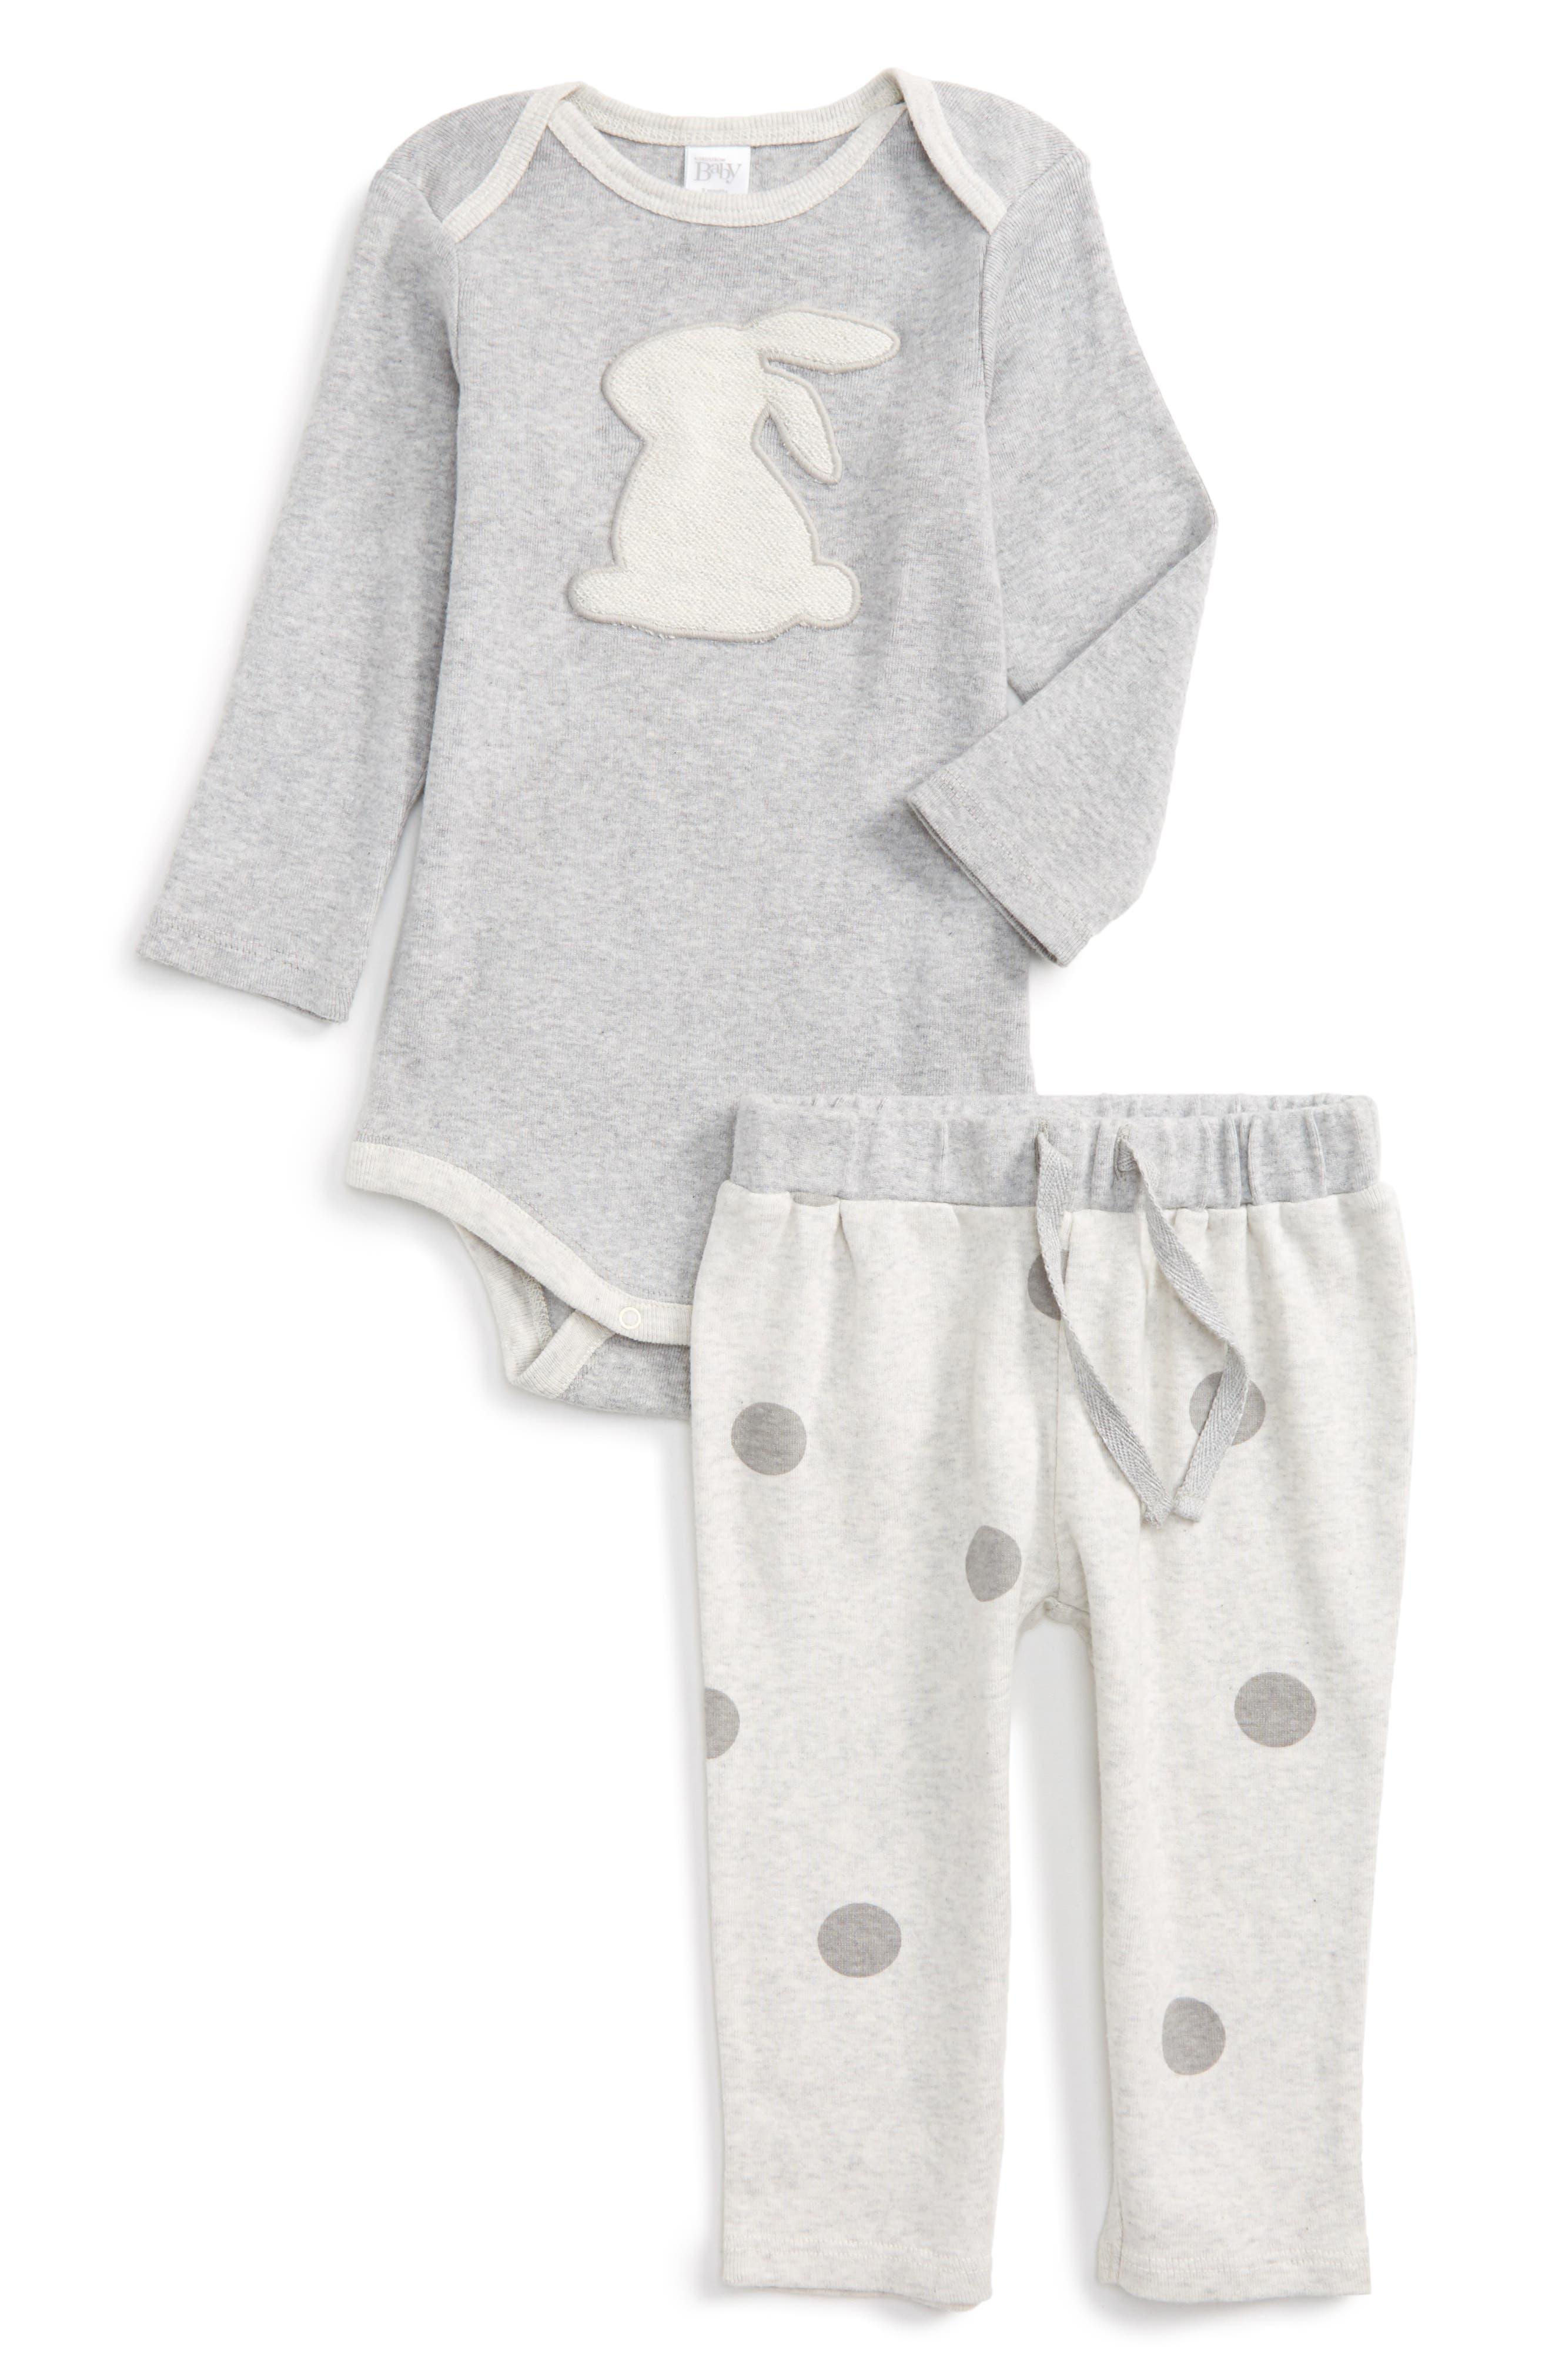 Nordstrom Baby Bunny Appliqué Bodysuit & Polka Dot Pants Set (Baby)